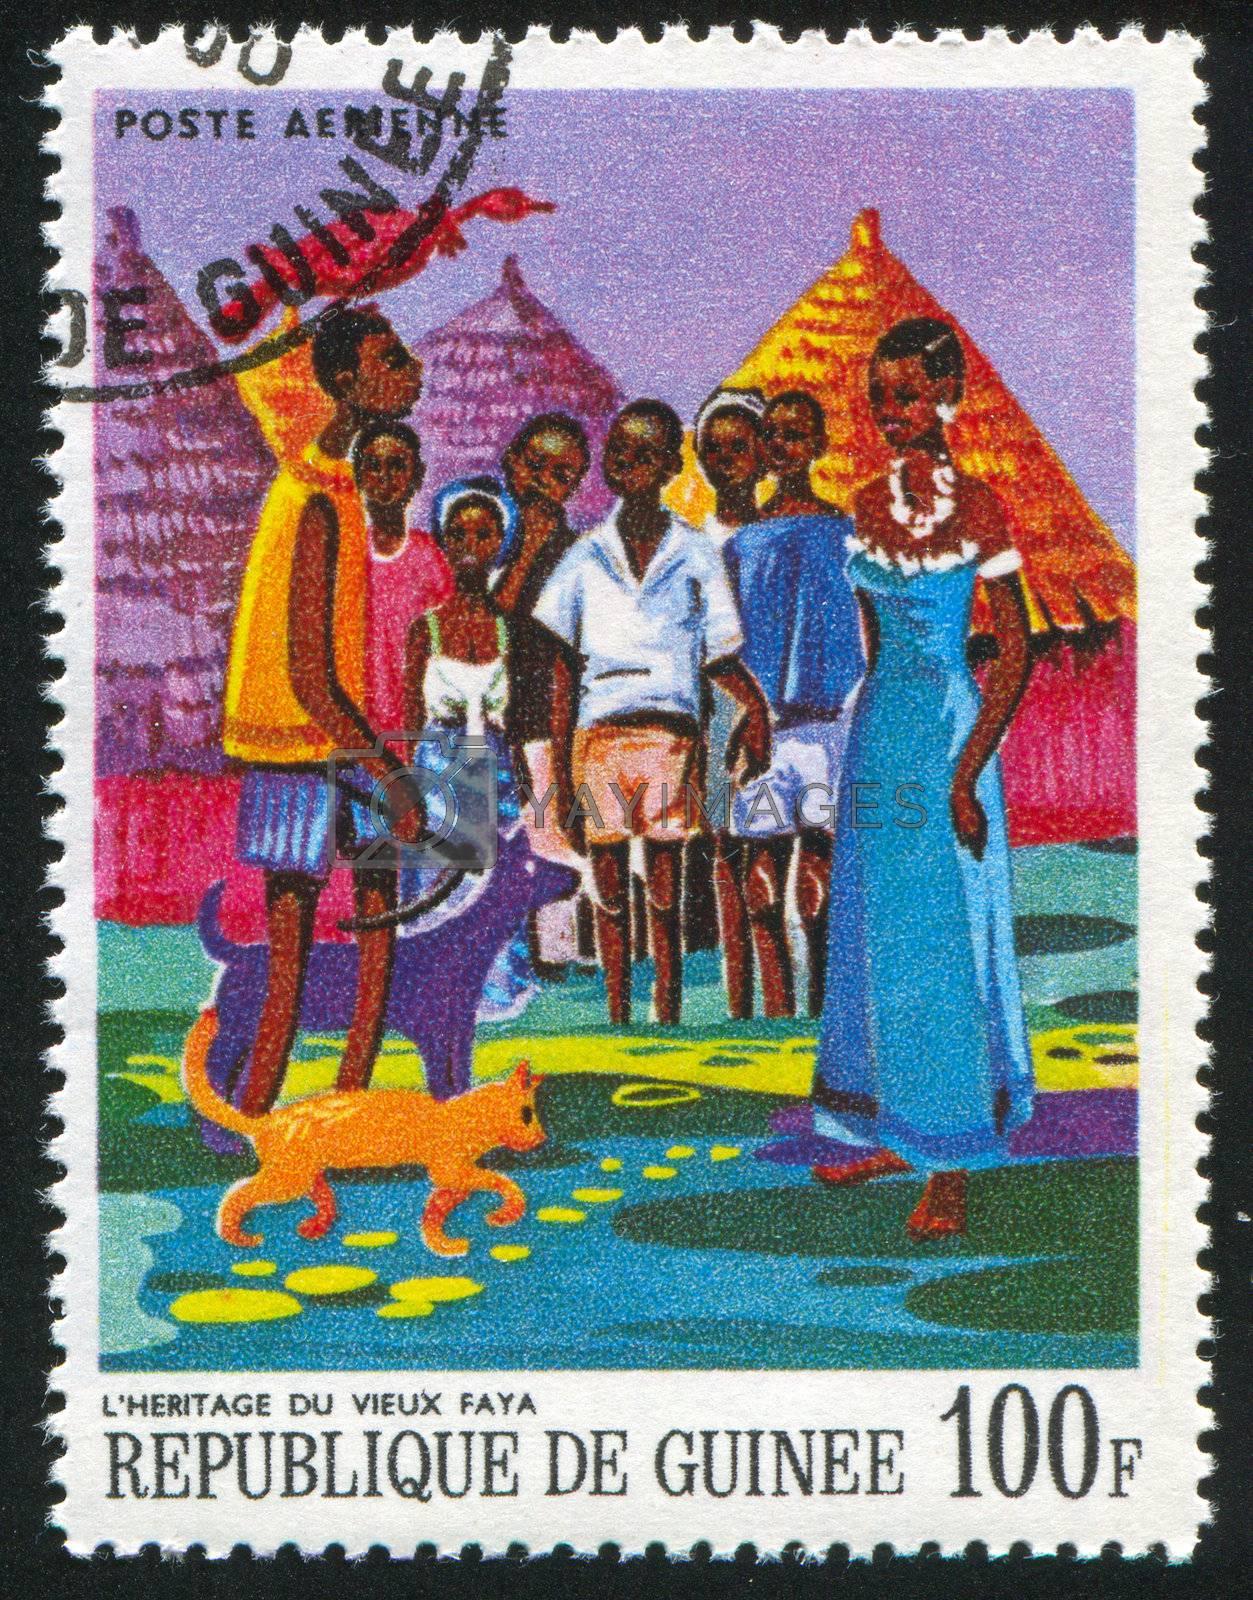 GUINEA CIRCA 1968: stamp printed by Guinea, shows Old Faya's Inheritance, circa 1968